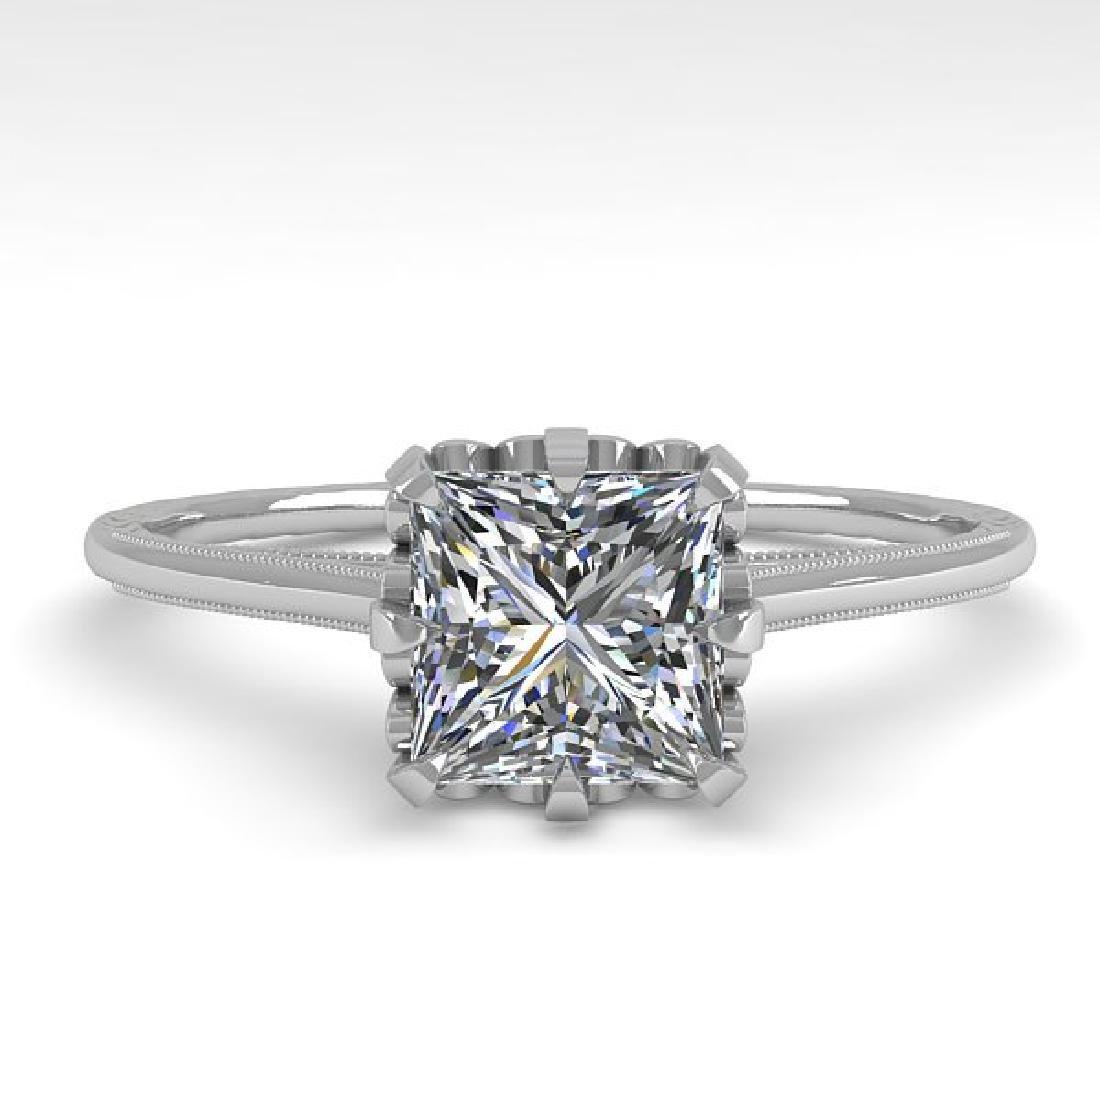 1.0 CTW VS/SI Princess Diamond Solitaire Ring 14K White